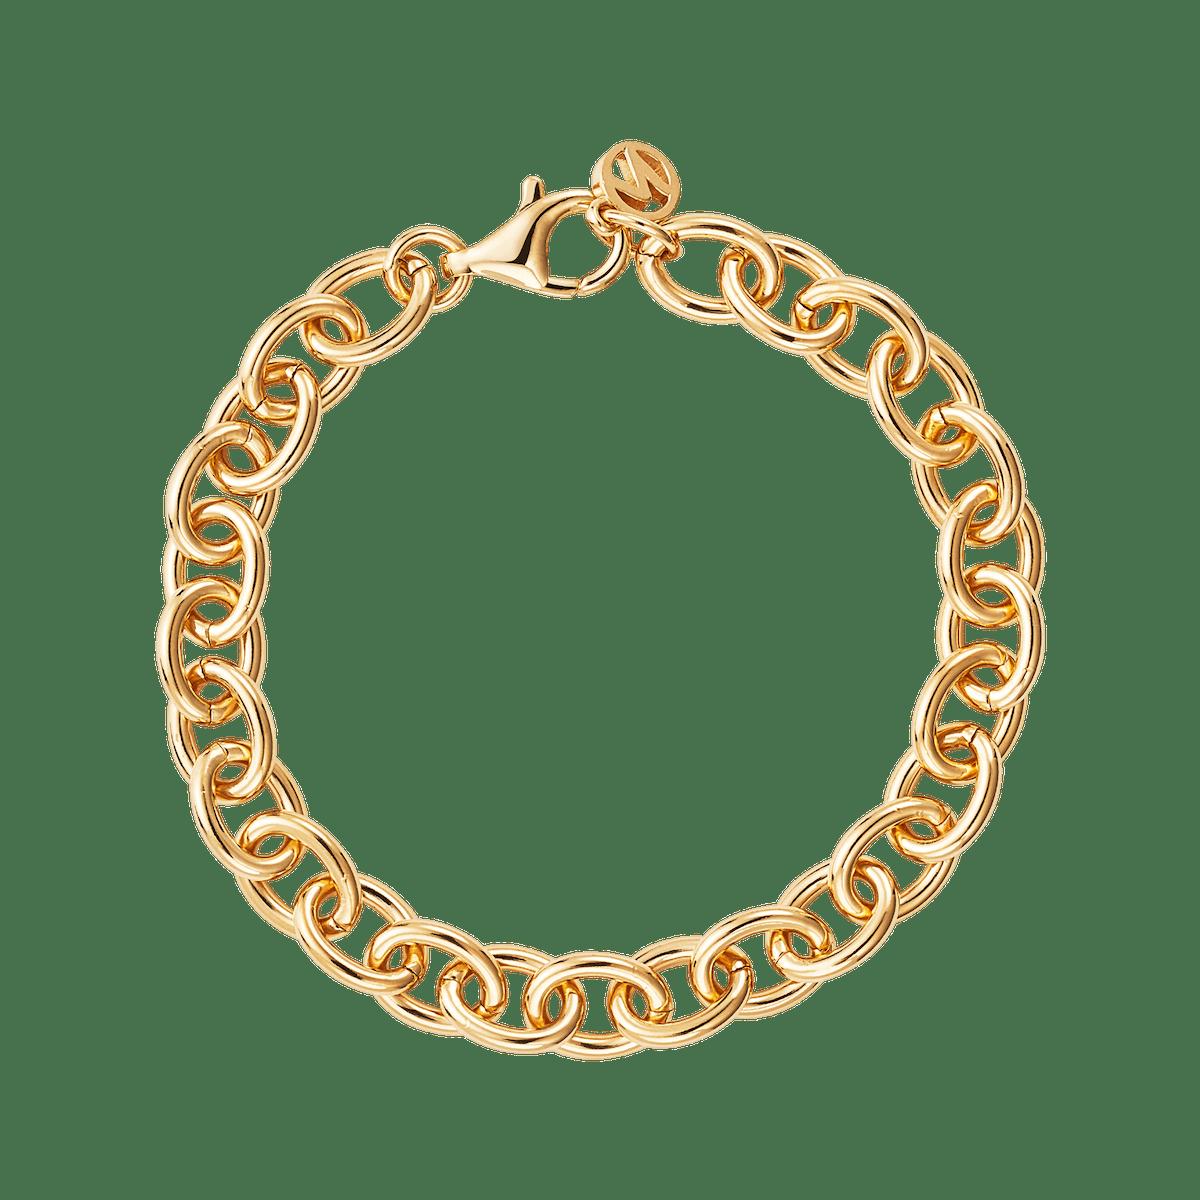 Drawn Cable Chain Bracelet